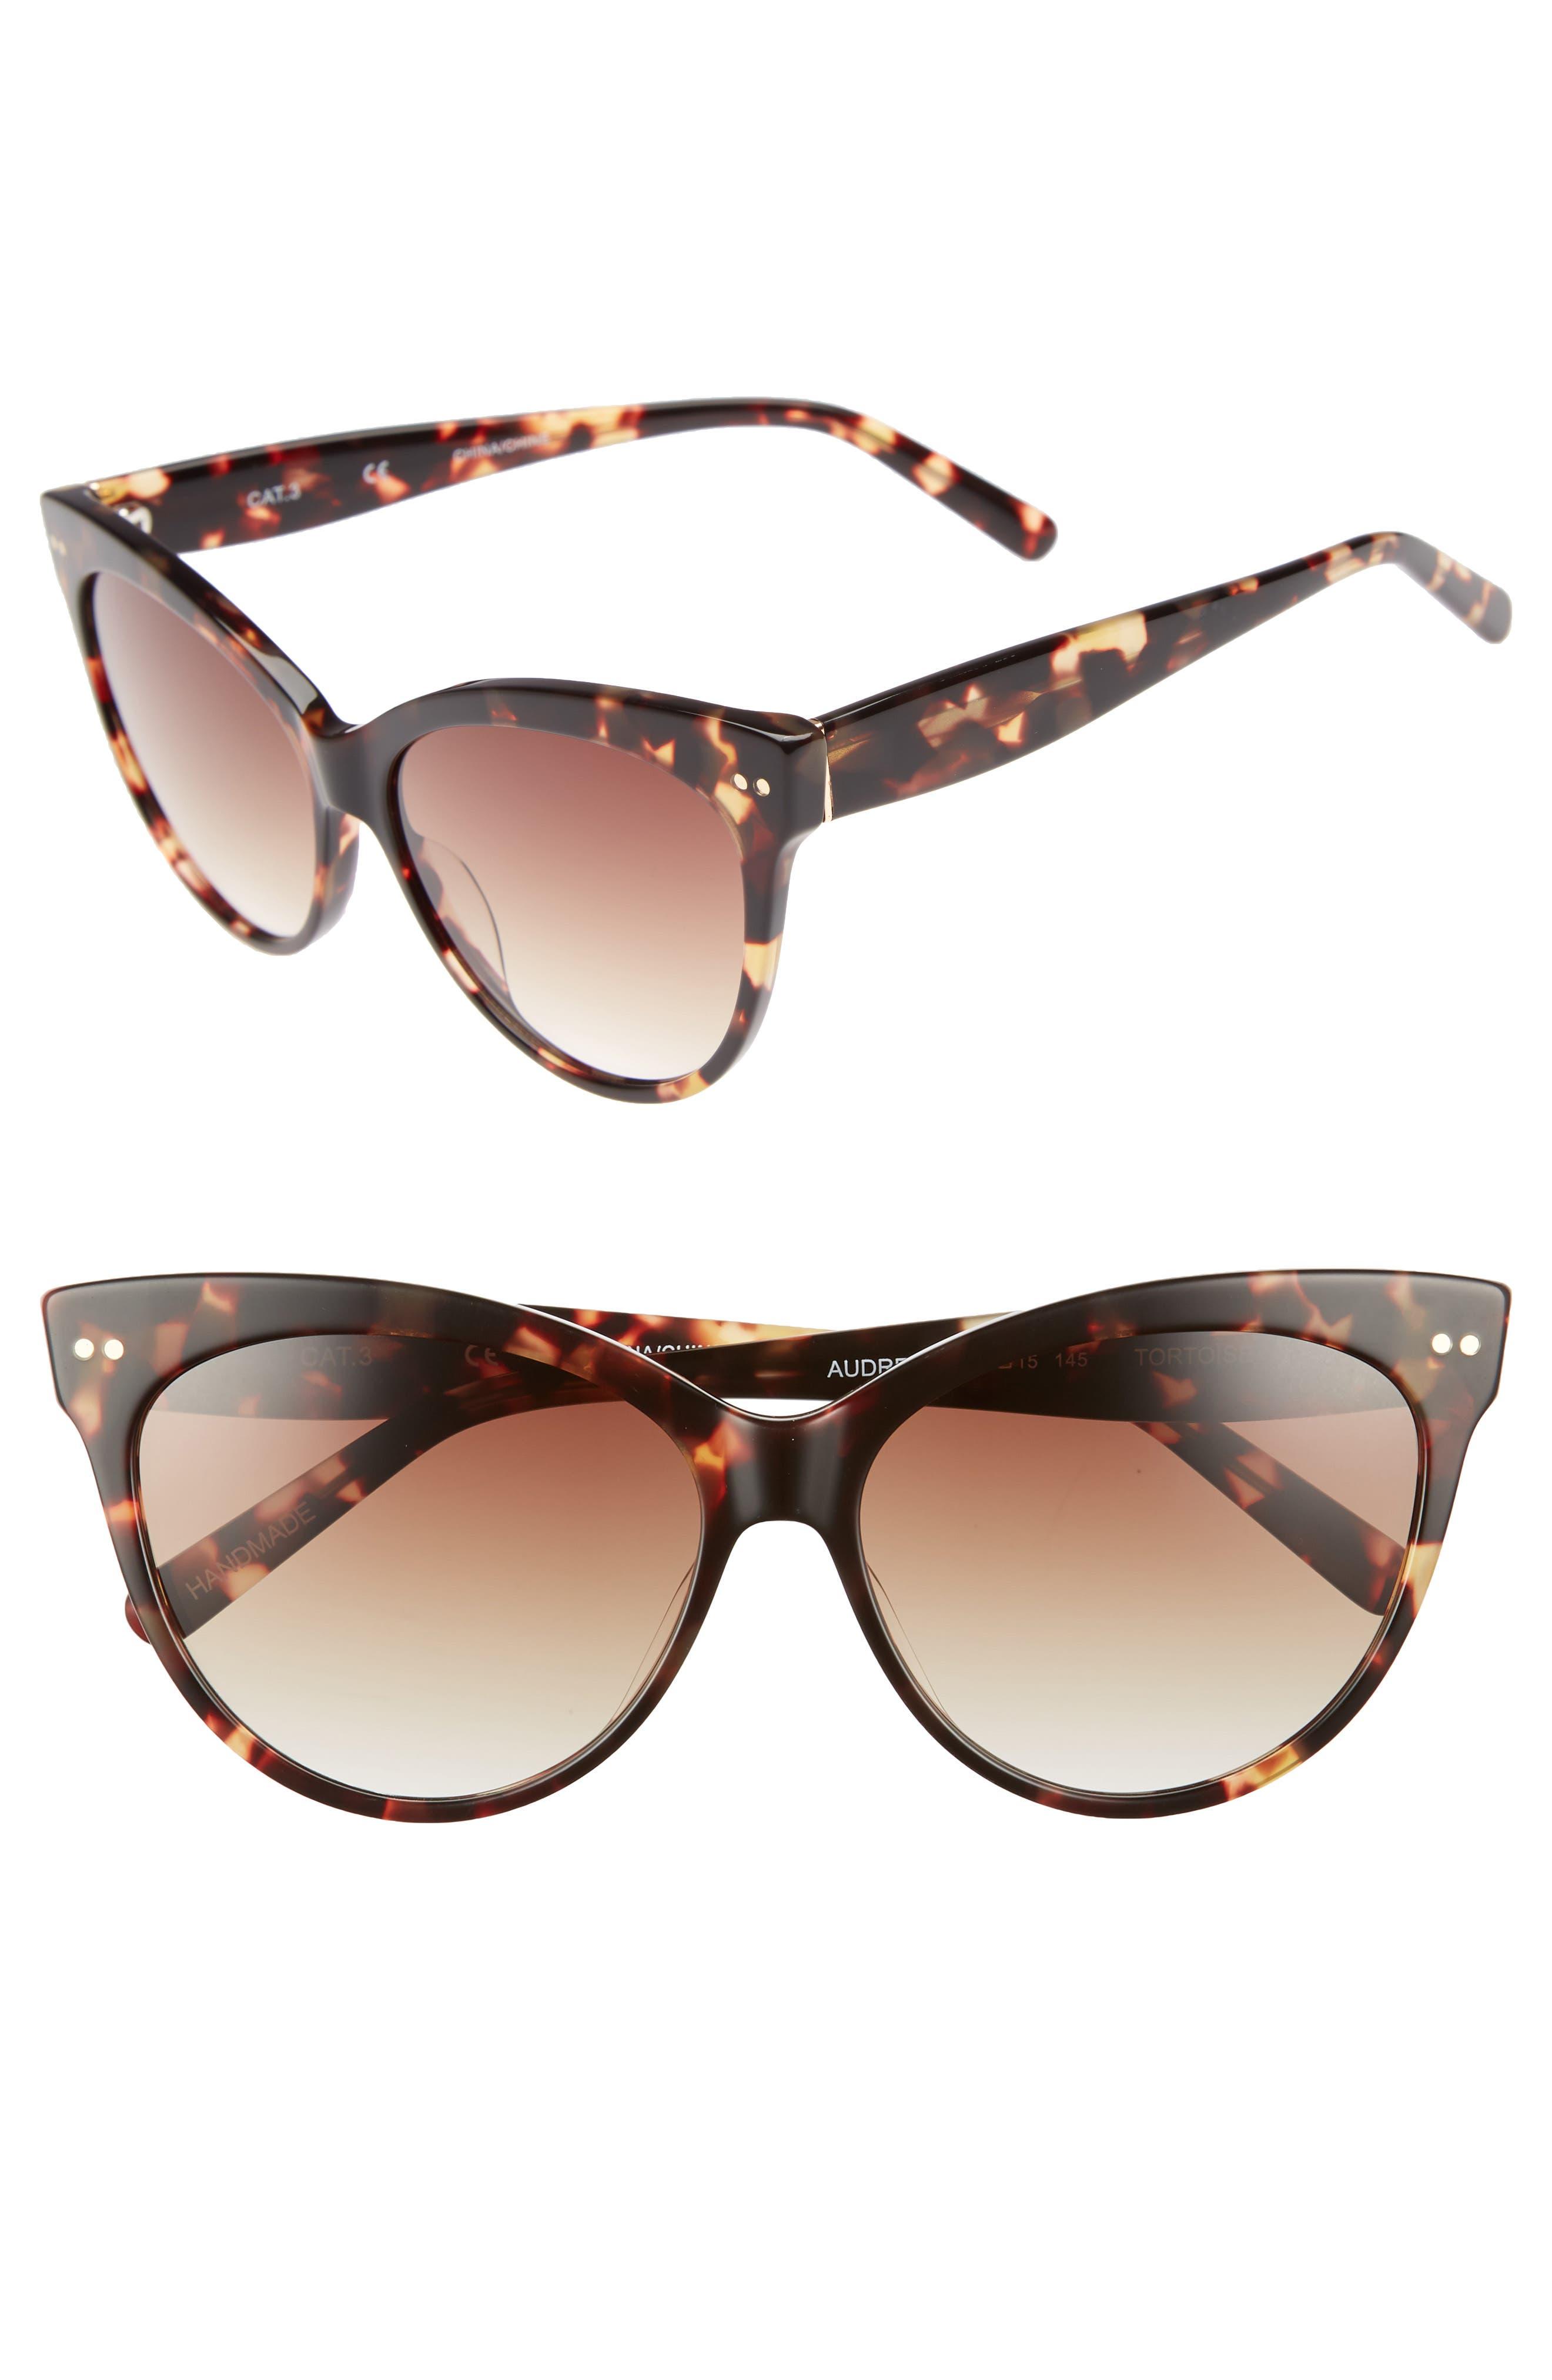 Audrey 60mm Cat Eye Sunglasses,                         Main,                         color, Brown Tortoise